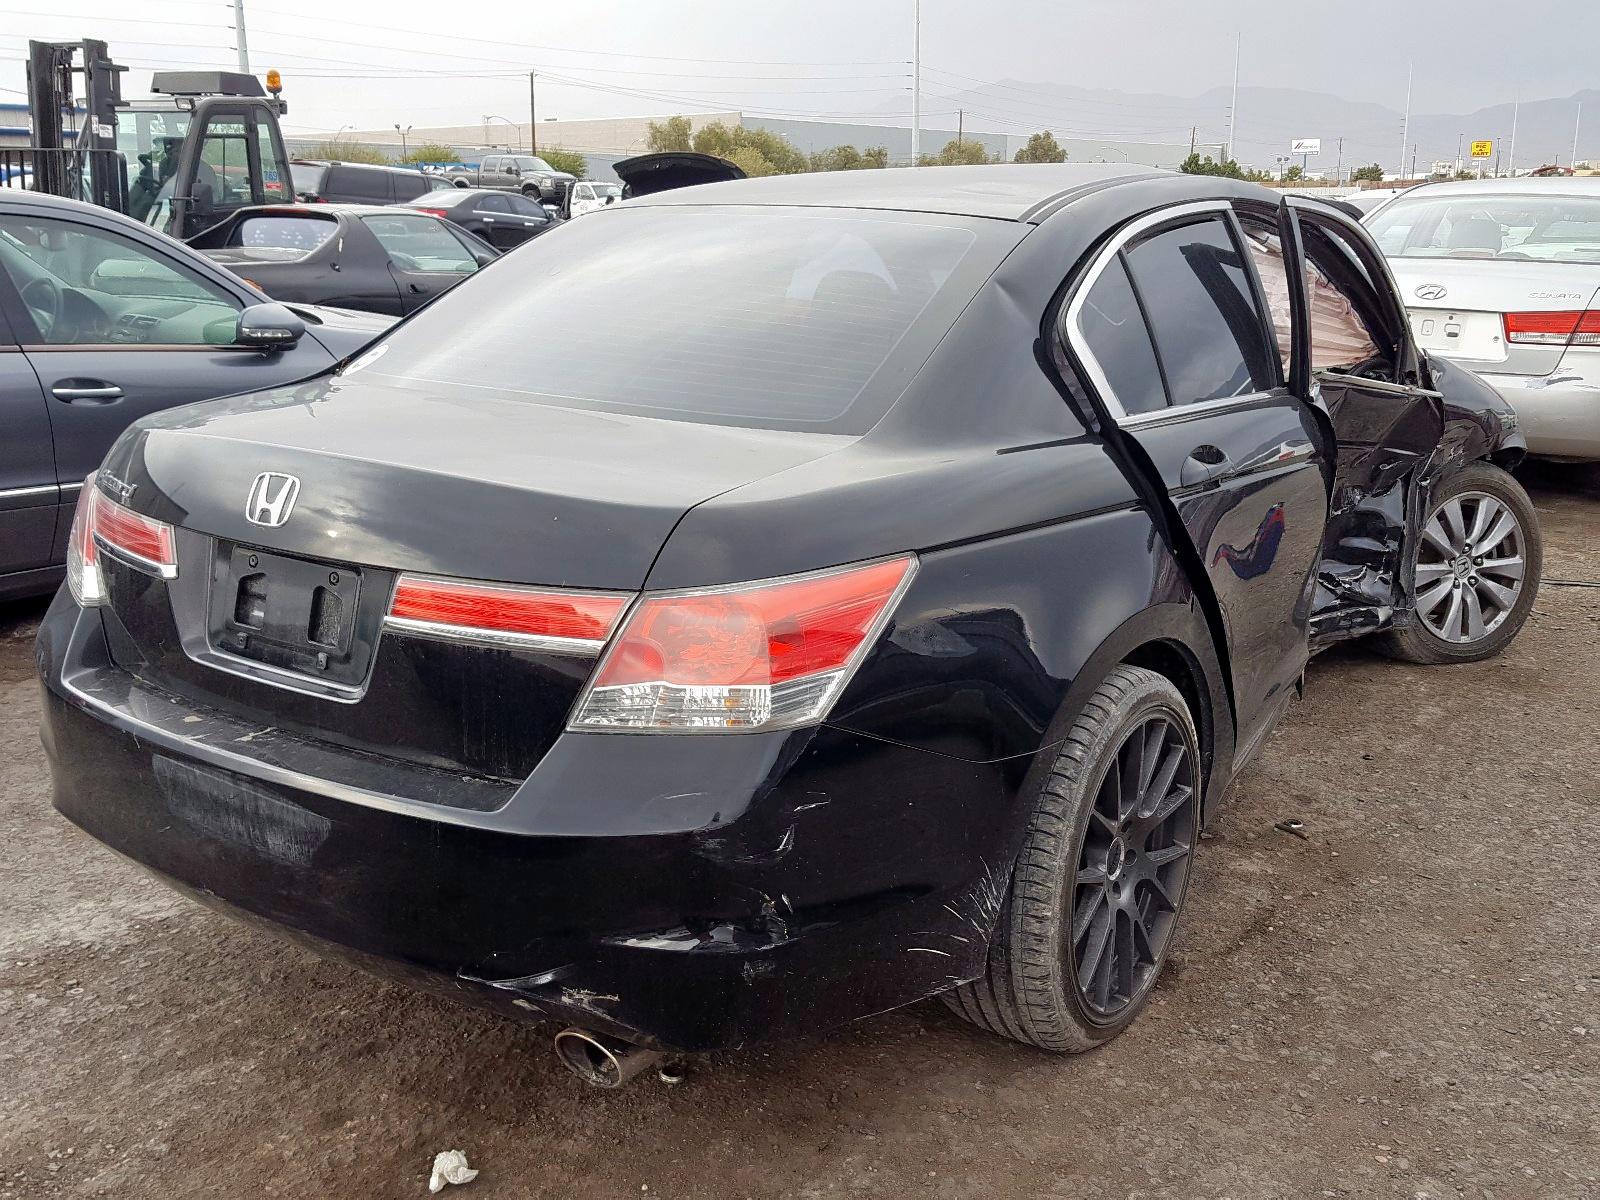 2011 Honda Accord Ex 2.4L rear view